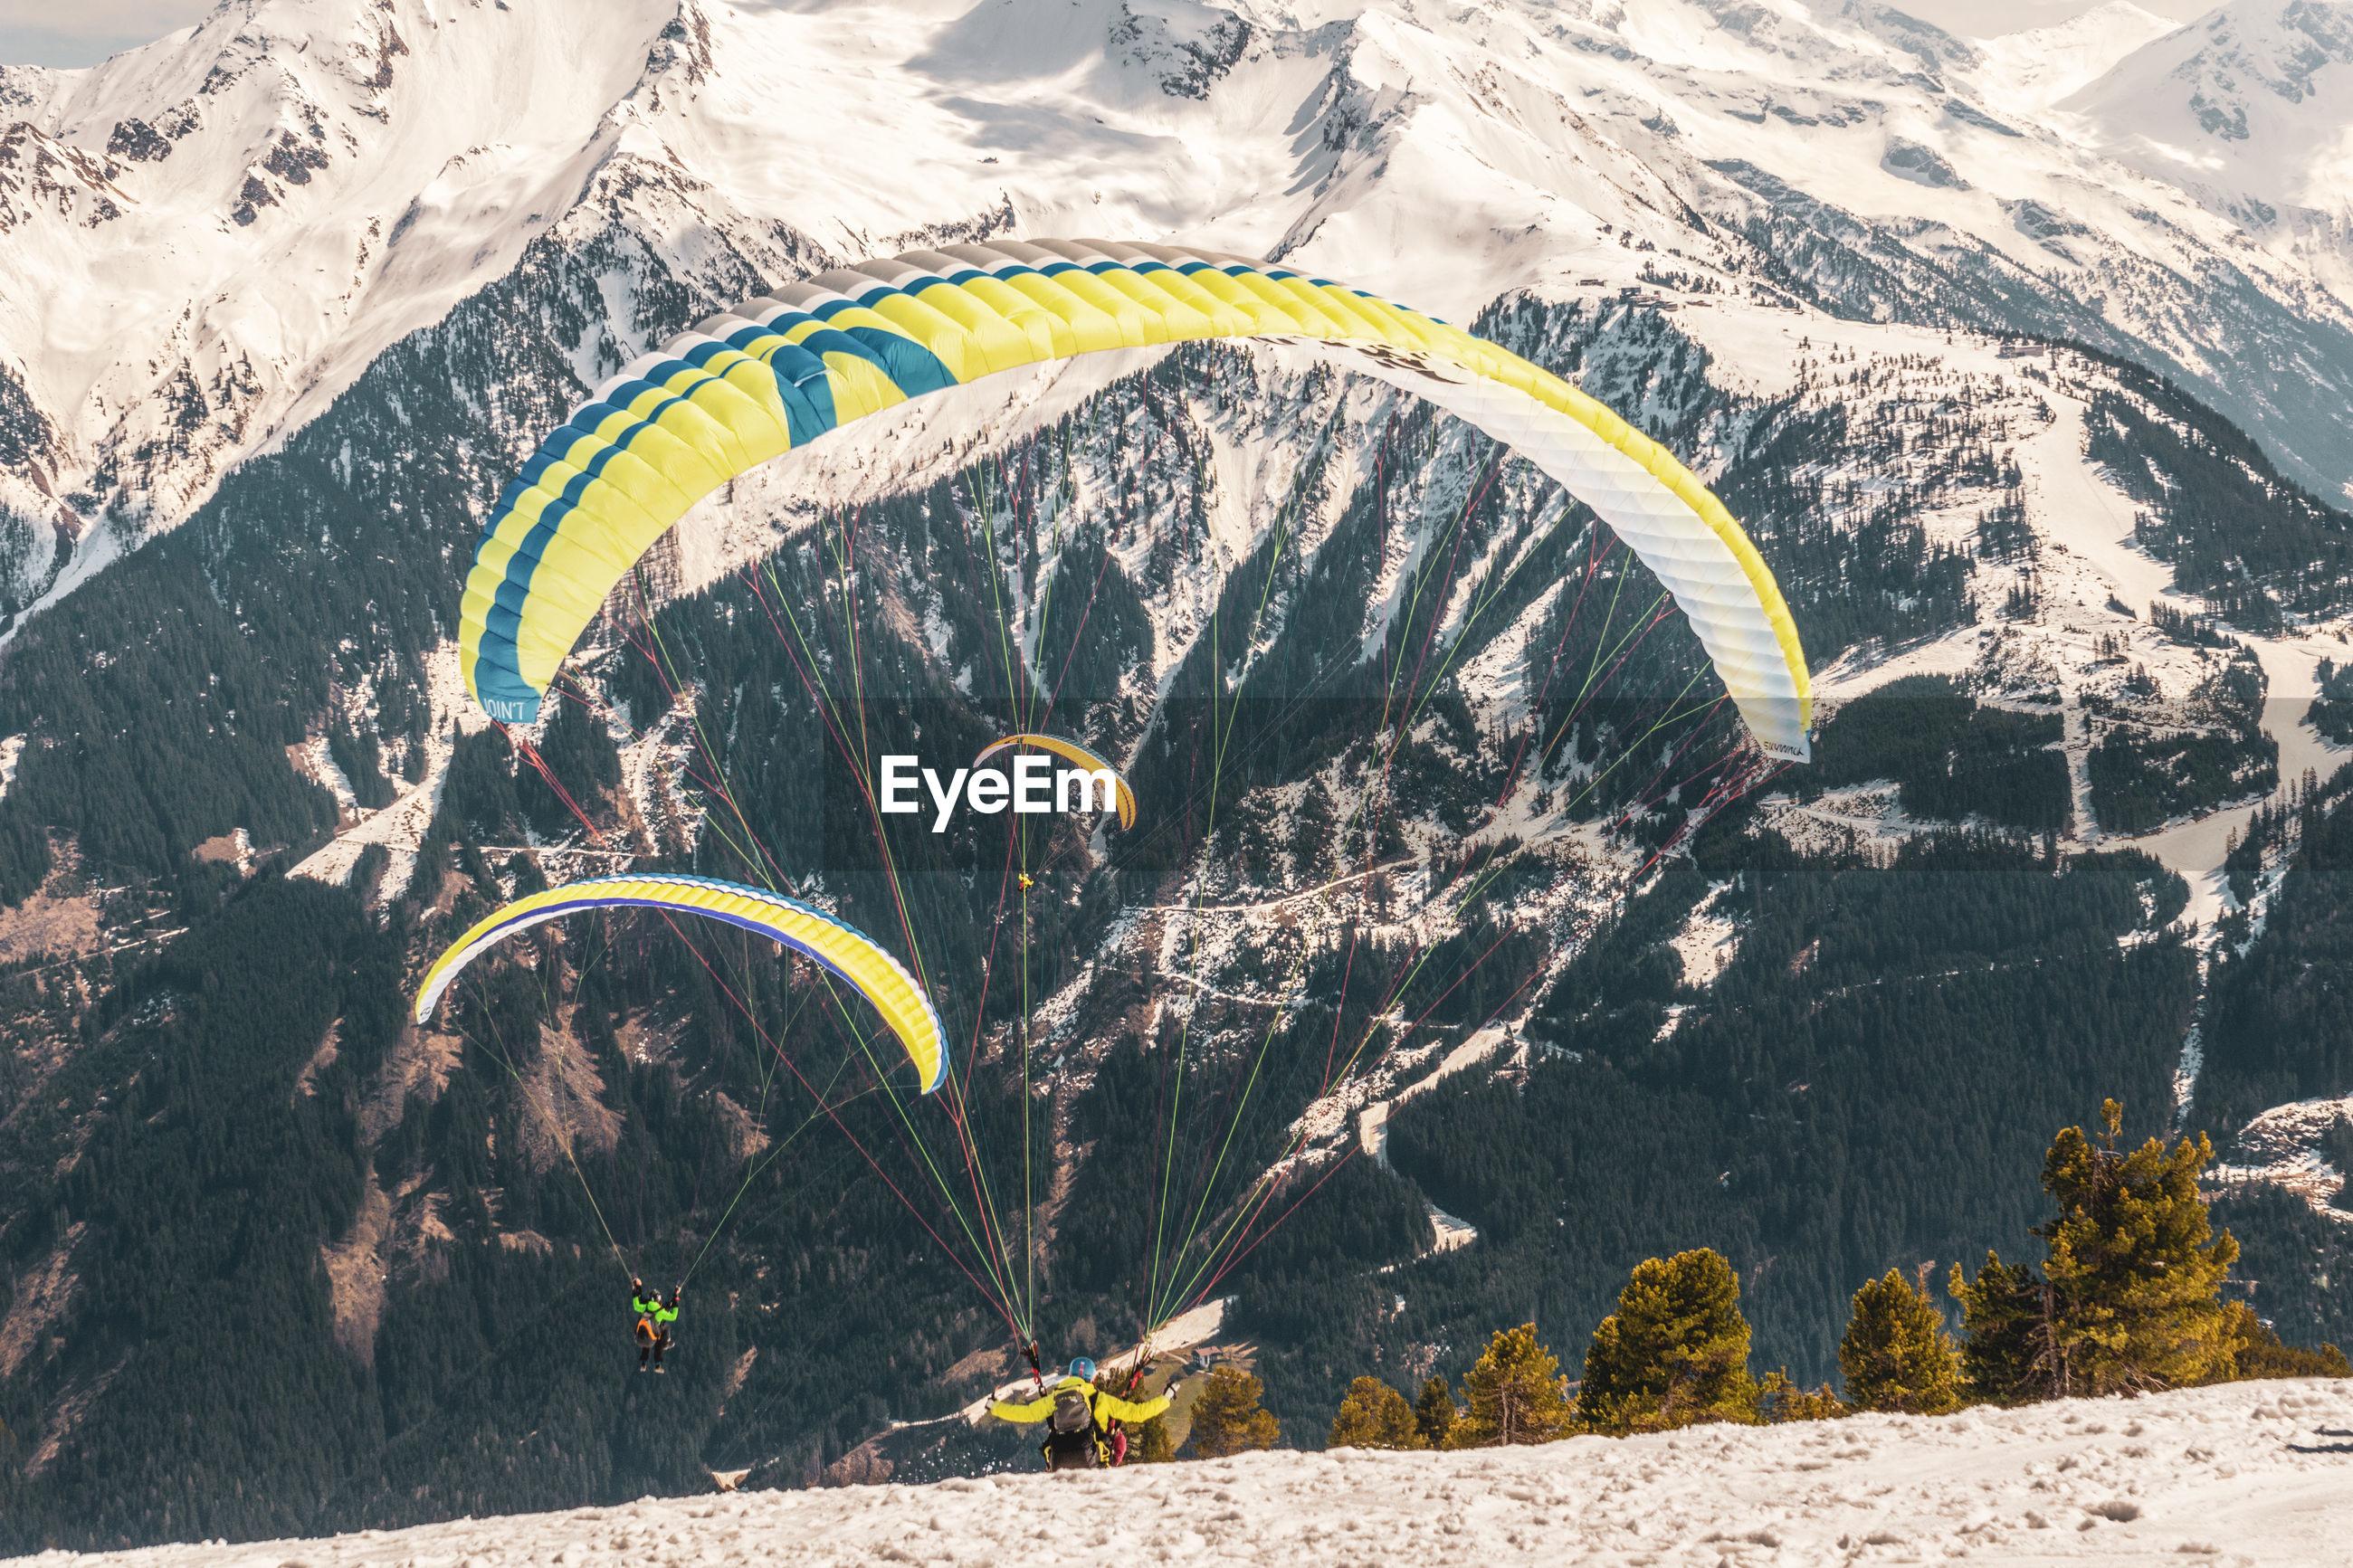 SCENIC VIEW OF SNOWCAPPED MOUNTAIN RANGE